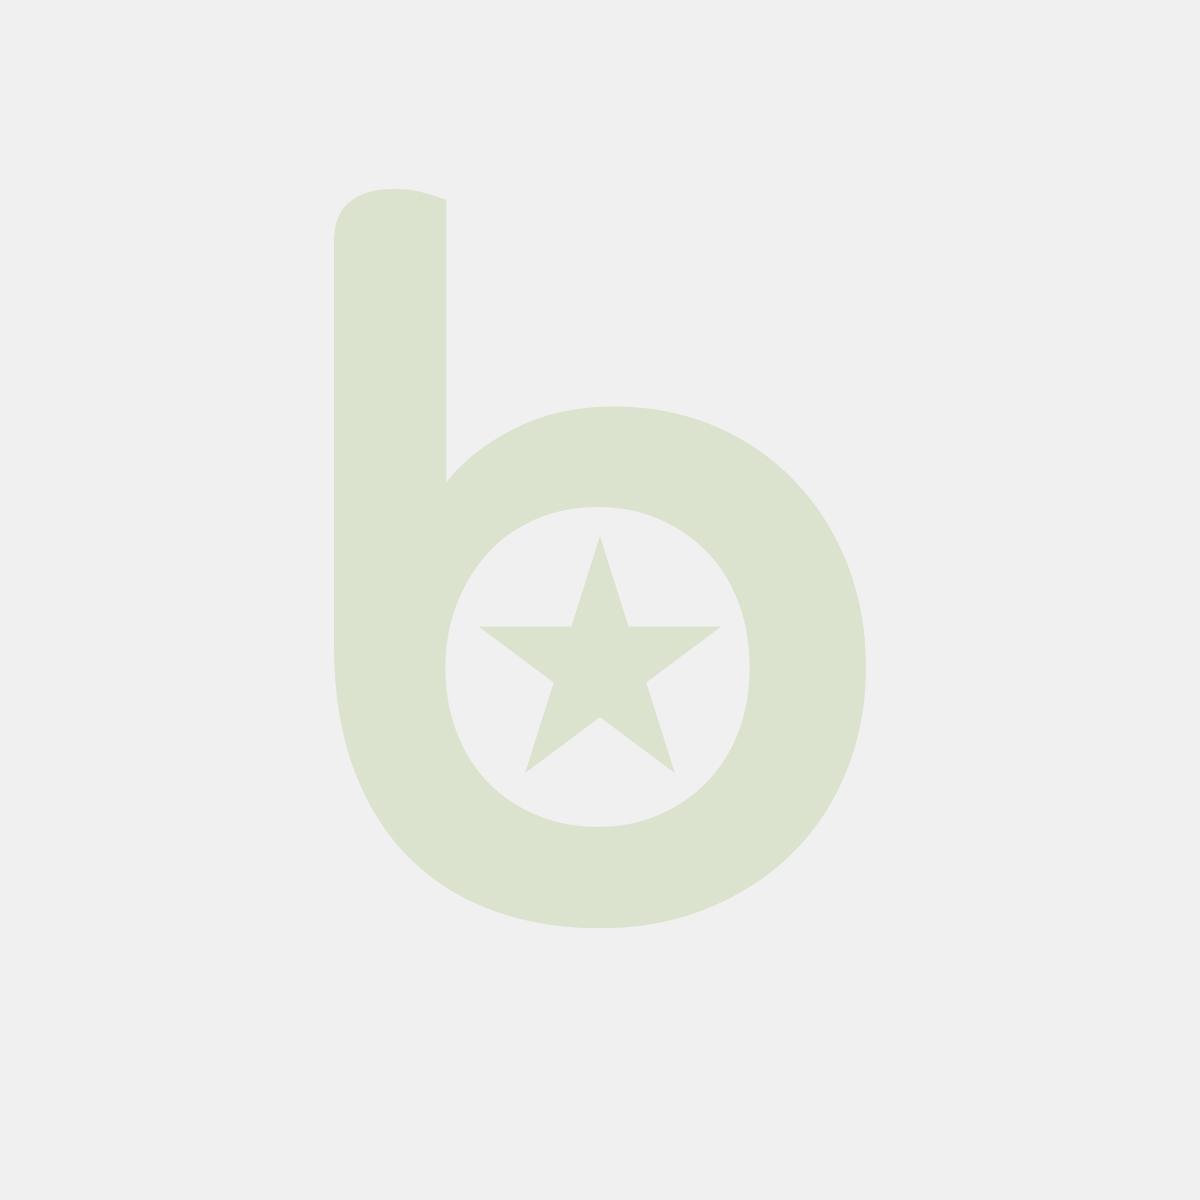 Etui, pochetki na sztućce serwetka PUNTA biała 38x32cm op. 50 sztuk